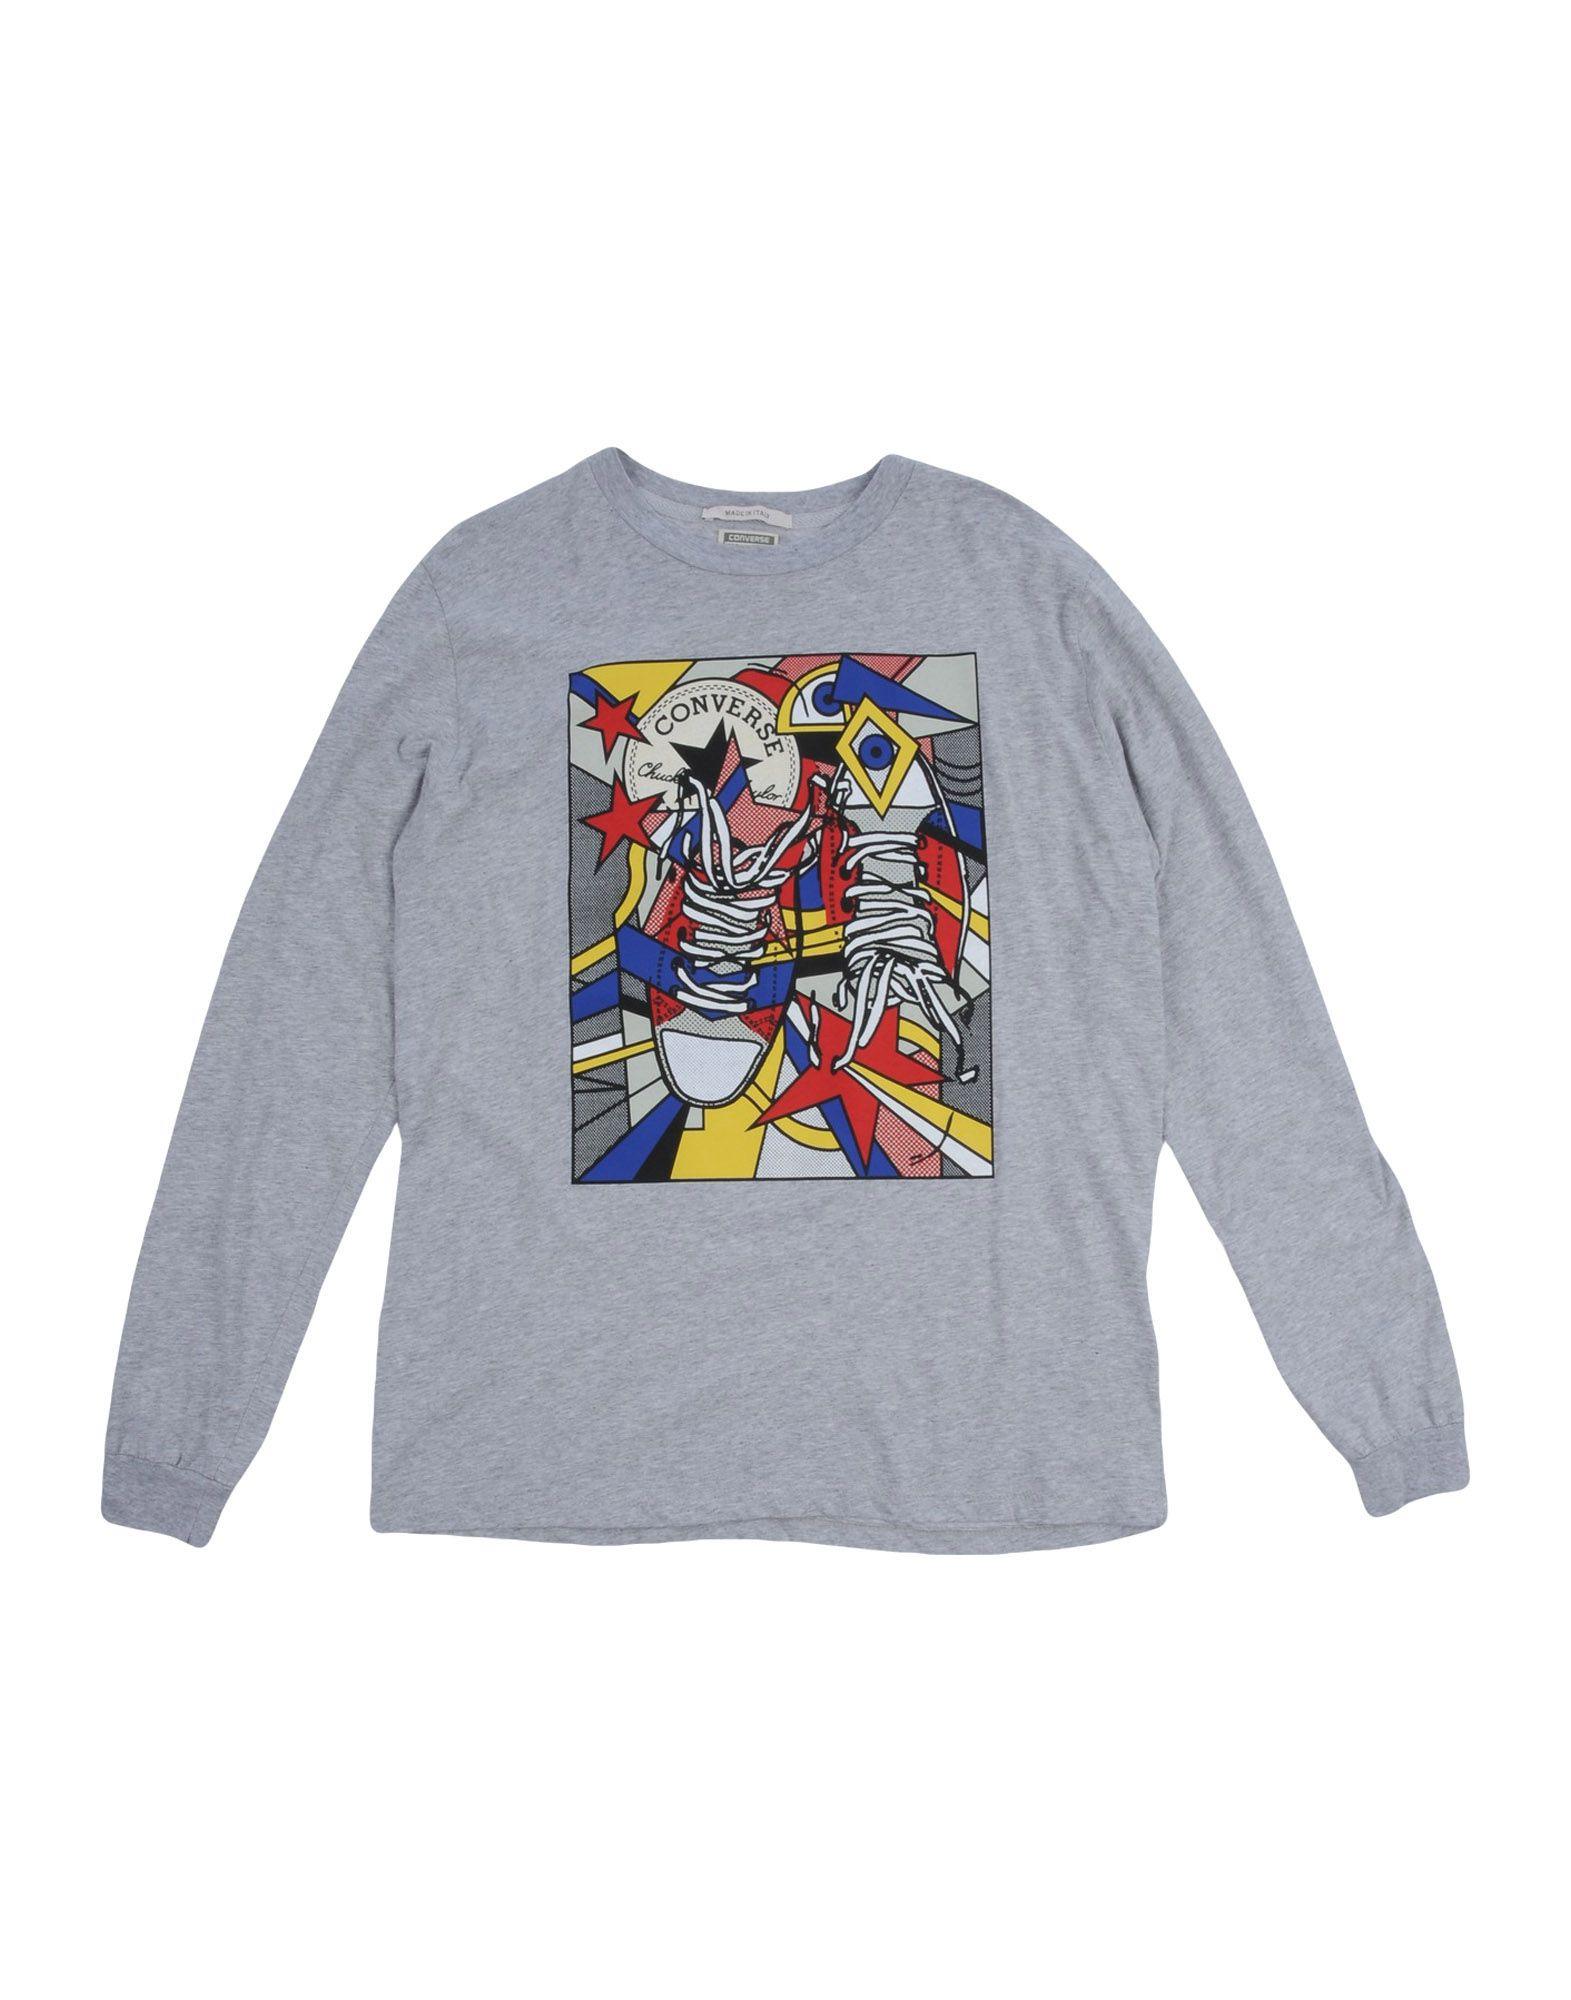 CONVERSE ALL STAR Jungen 9-16 jahre T-shirts Farbe Grau Größe 8